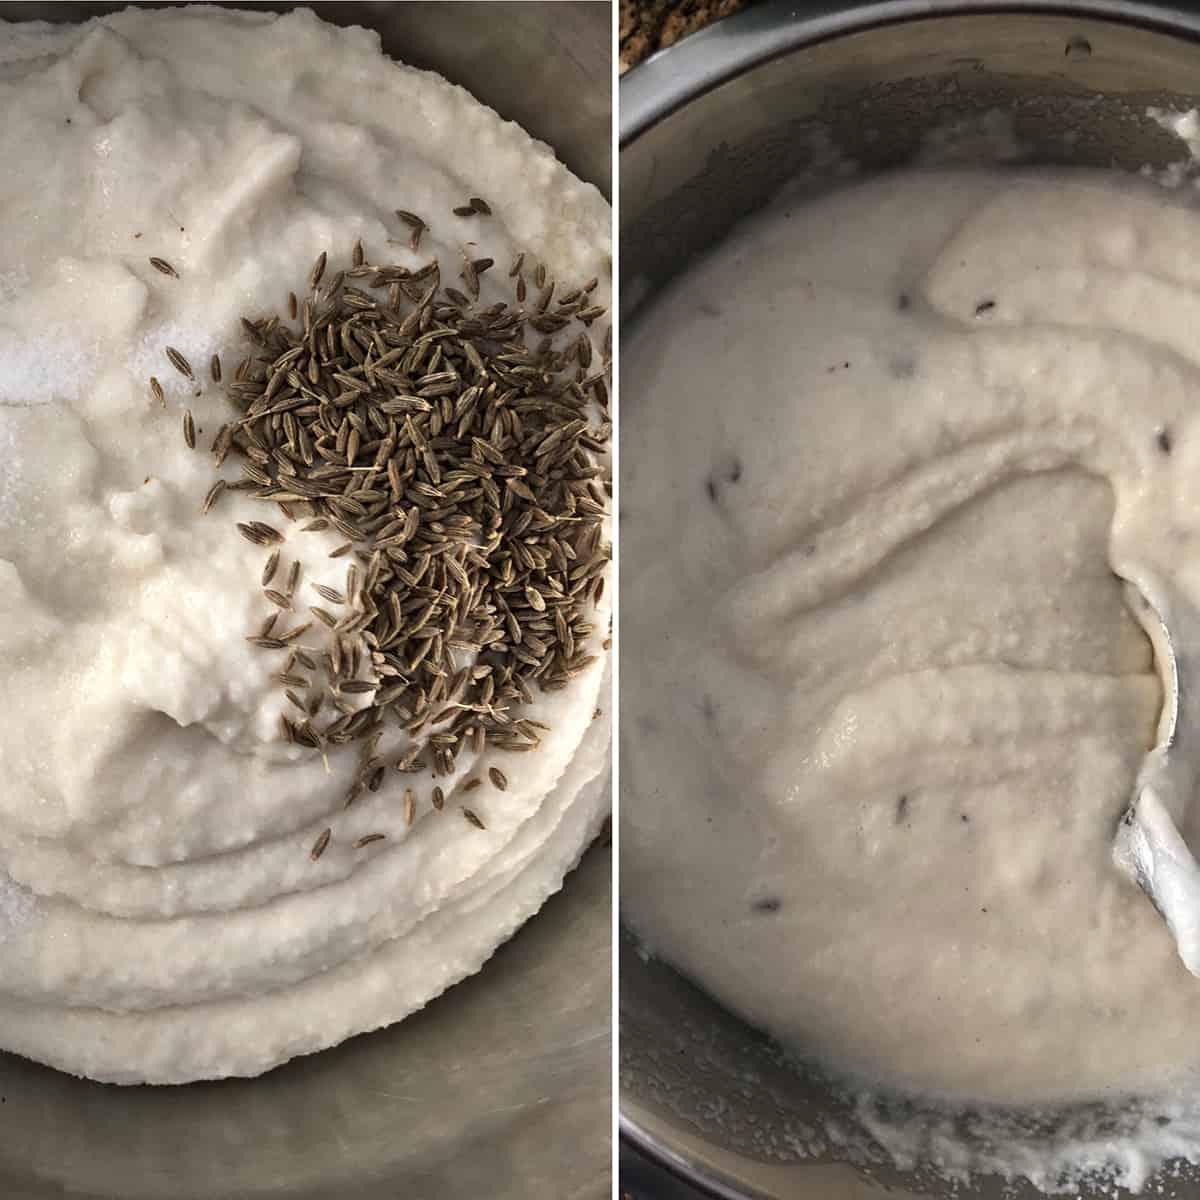 Cumin seeds added to idli batter